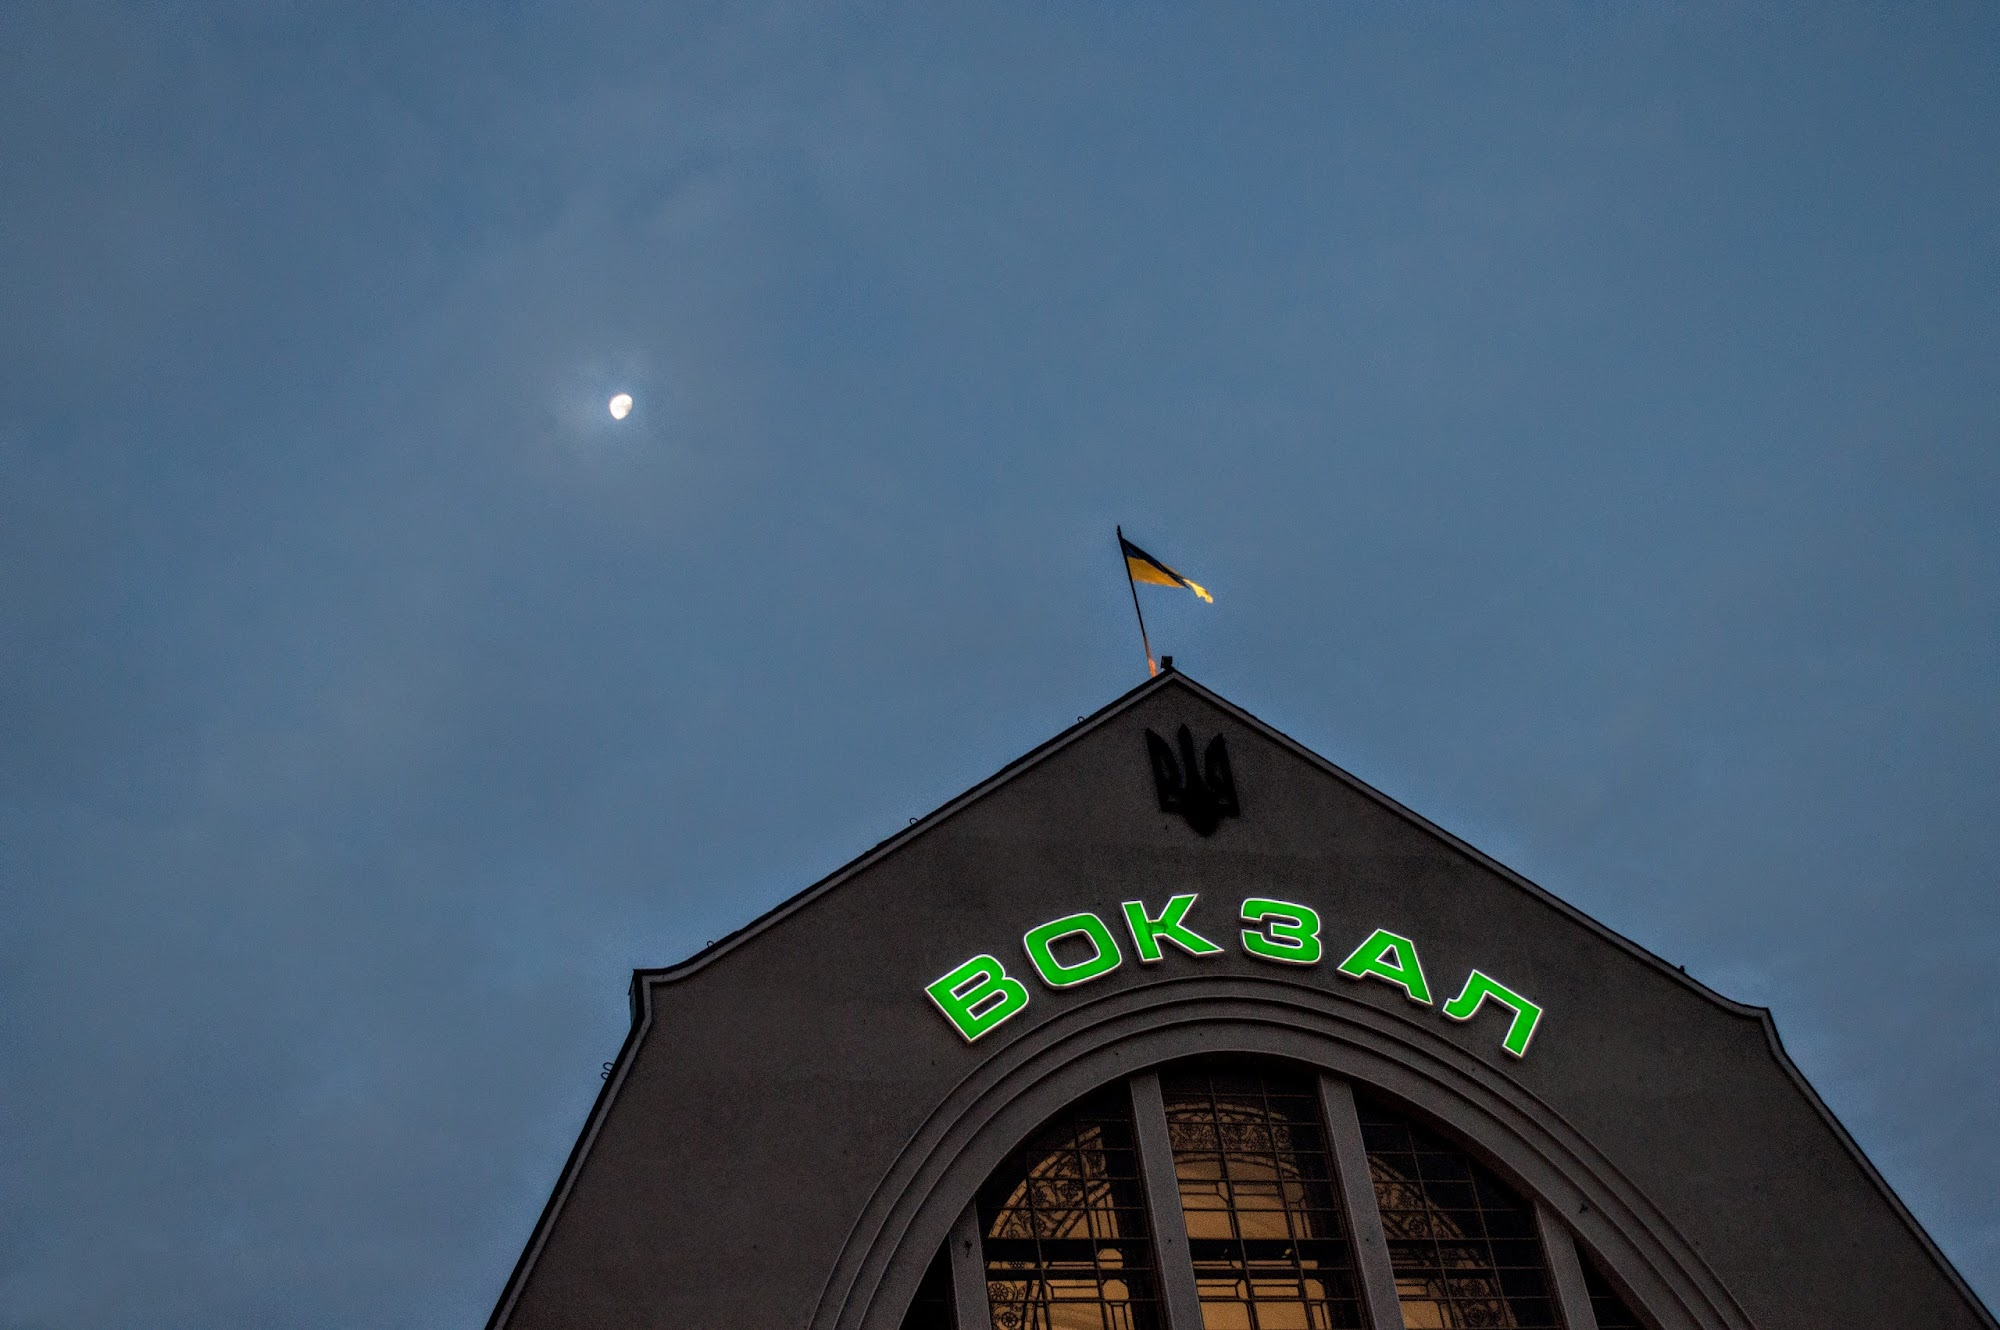 Вокзал - Київ